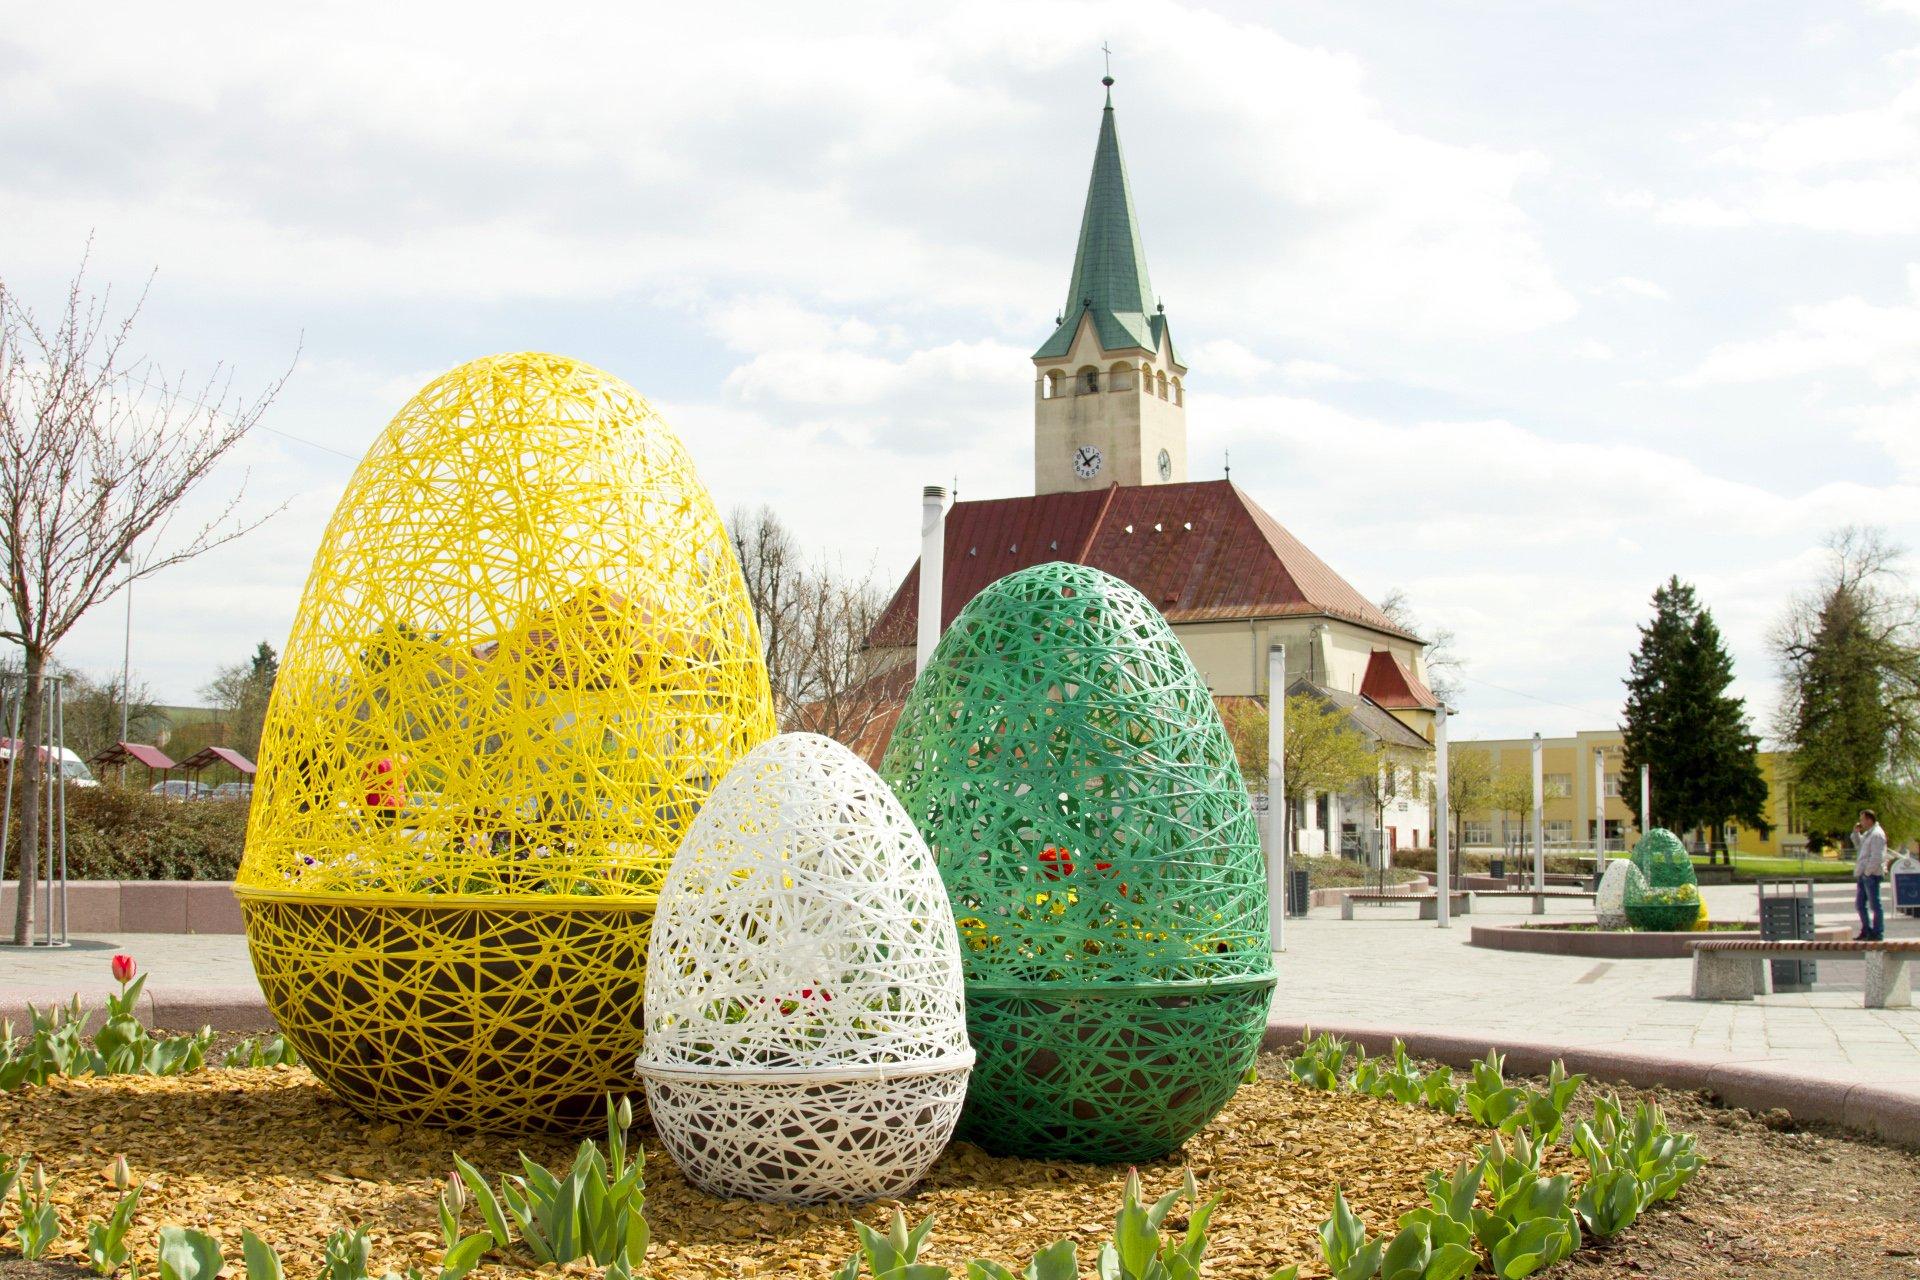 Wielkanocne dekoracje z fiberglassu – co i jak?